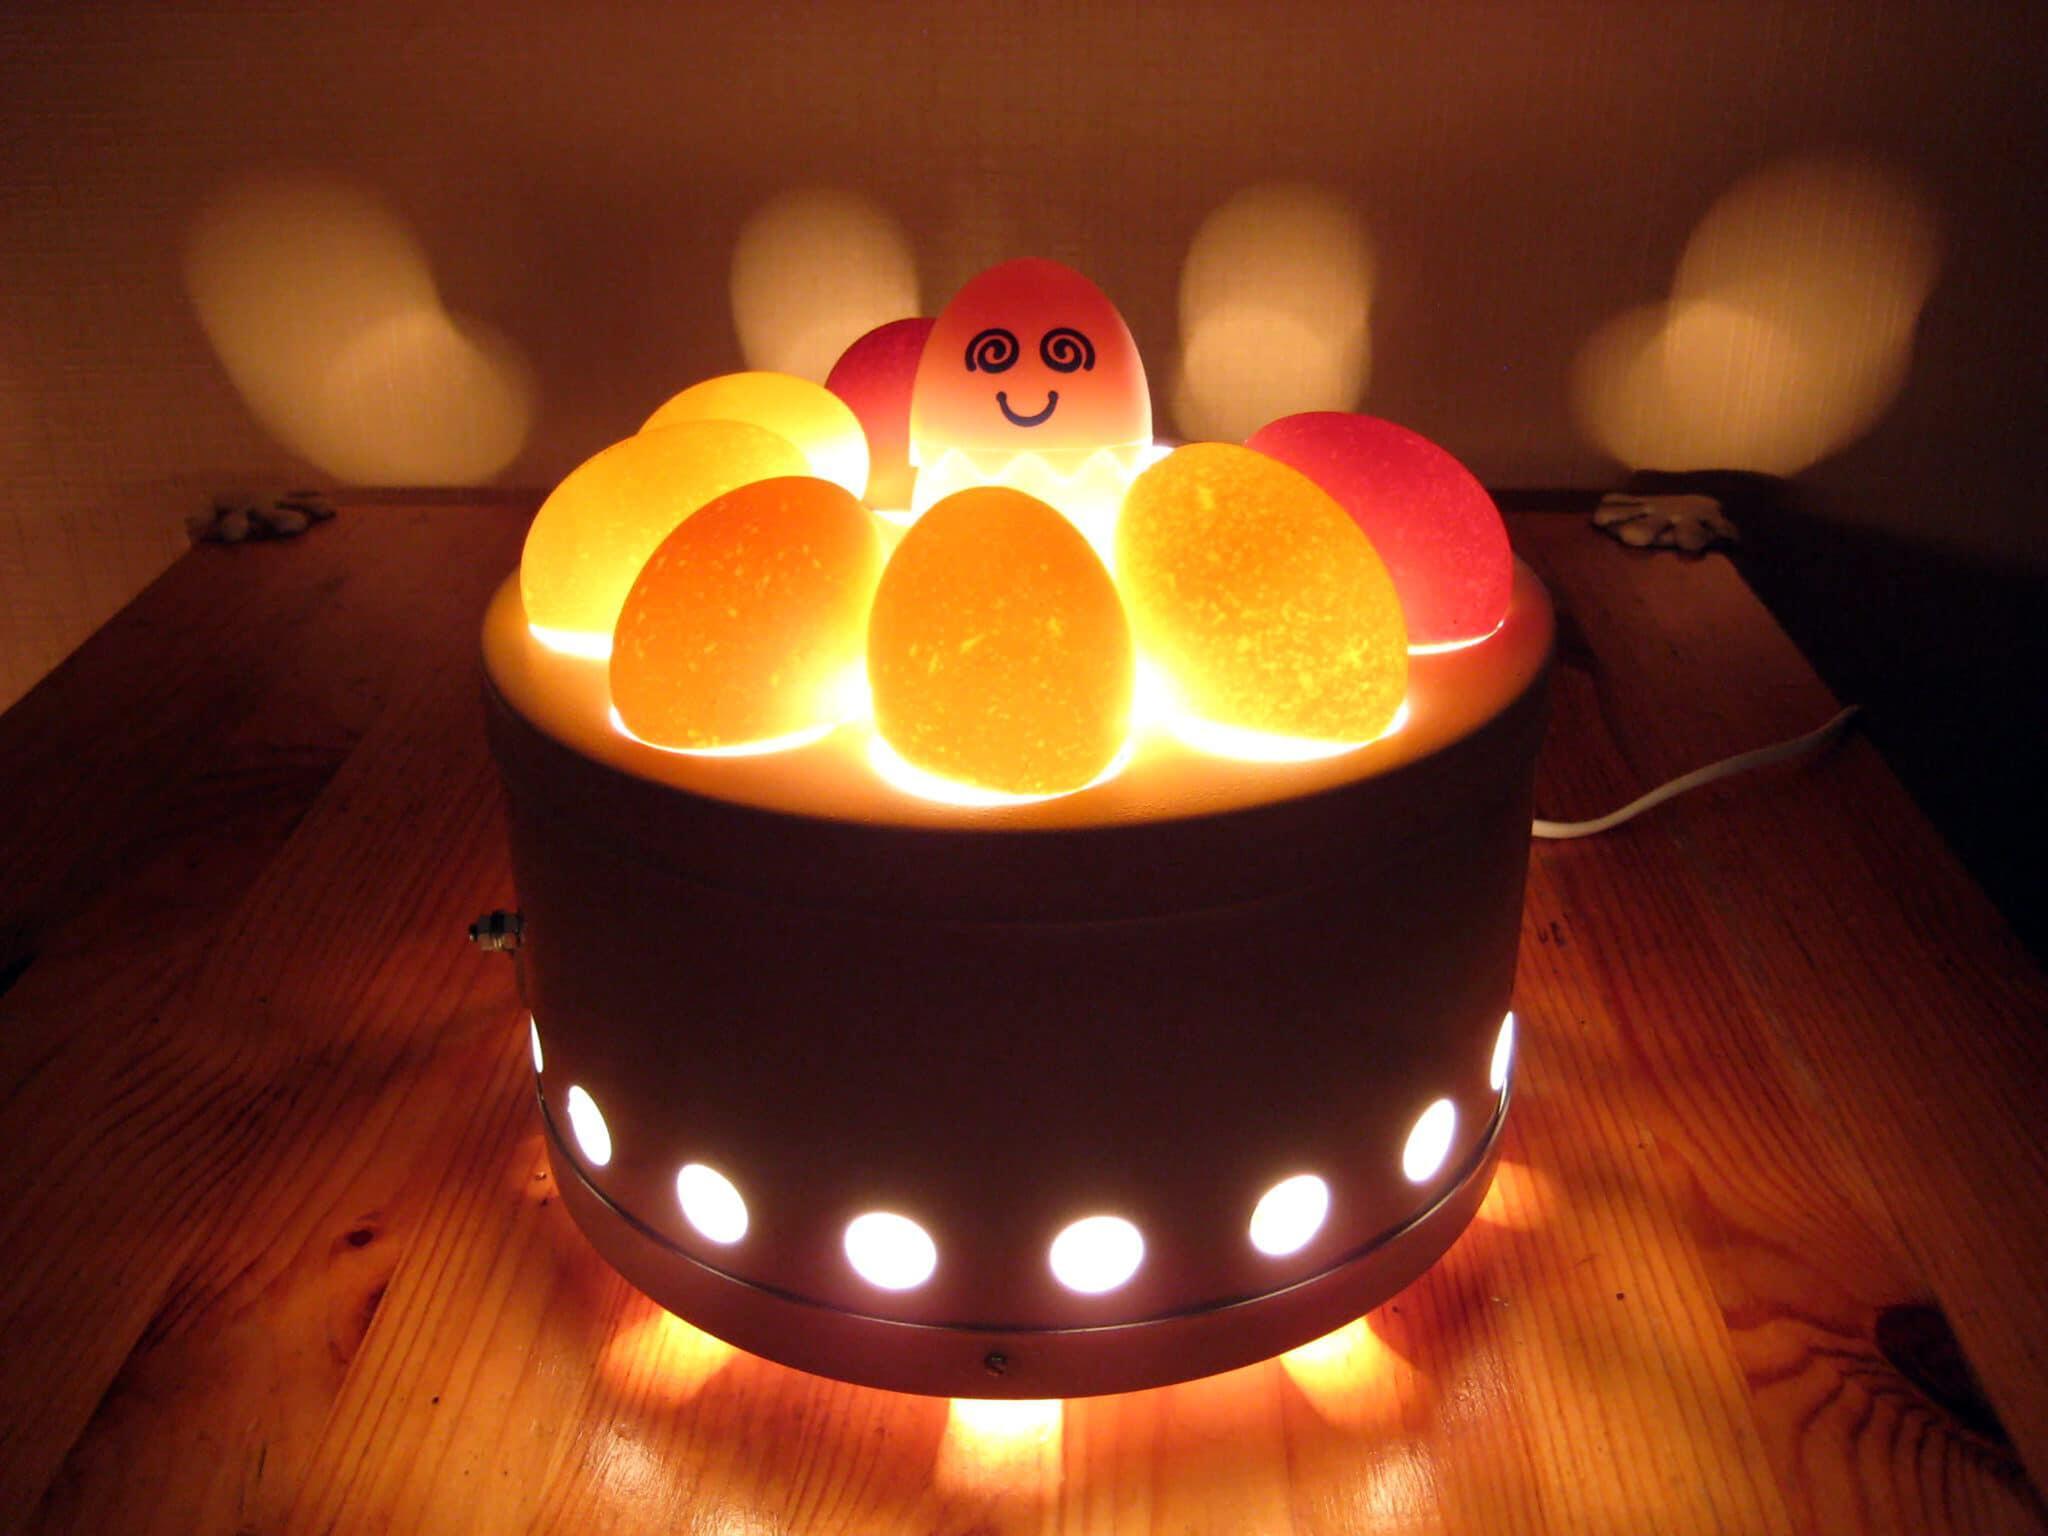 egg candler tester